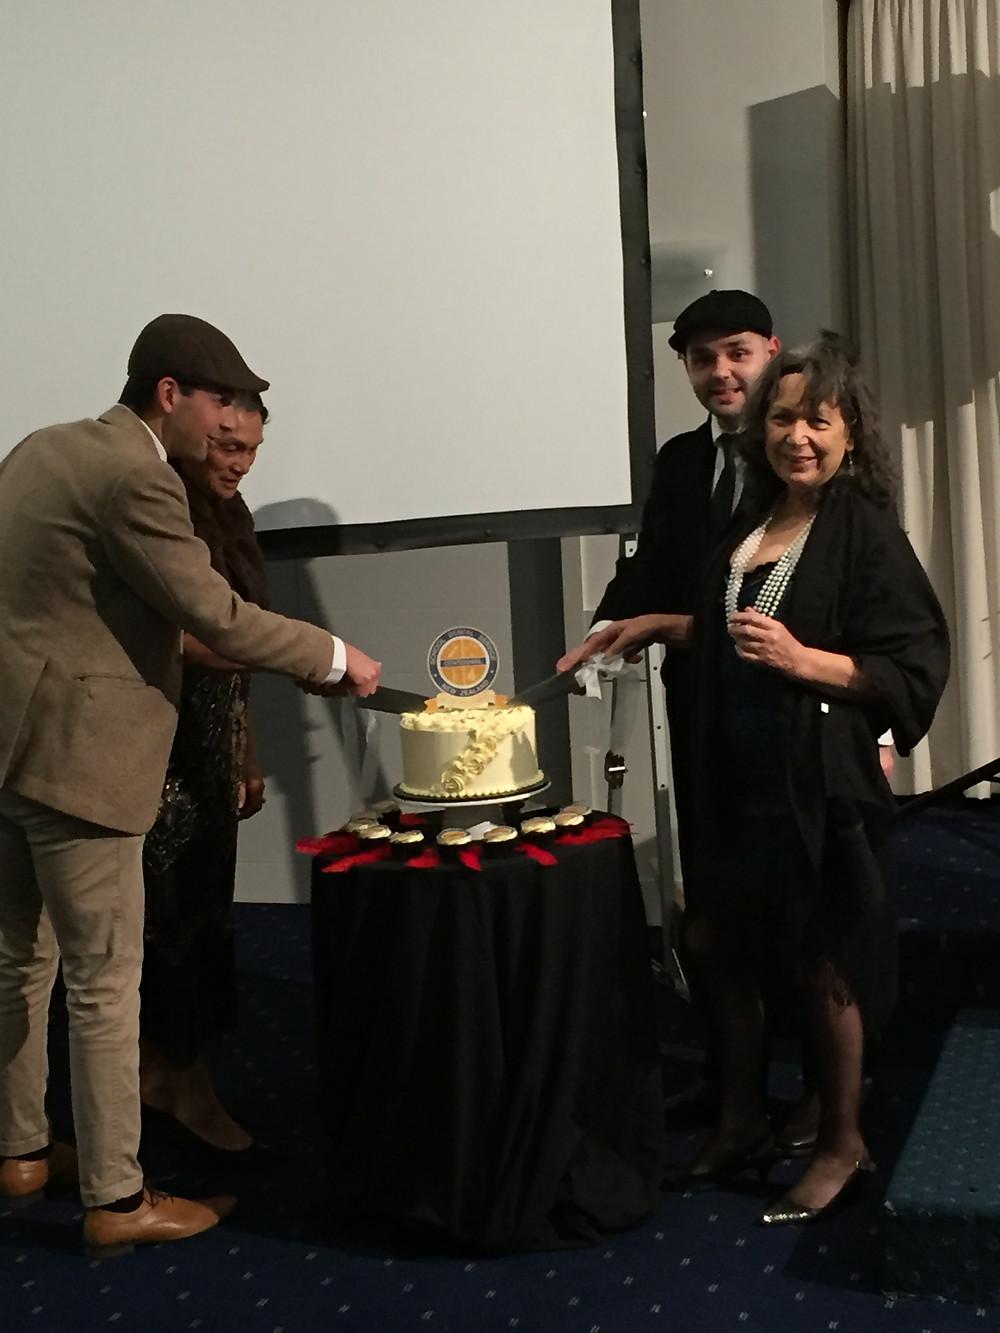 Vivenne cutting the cake